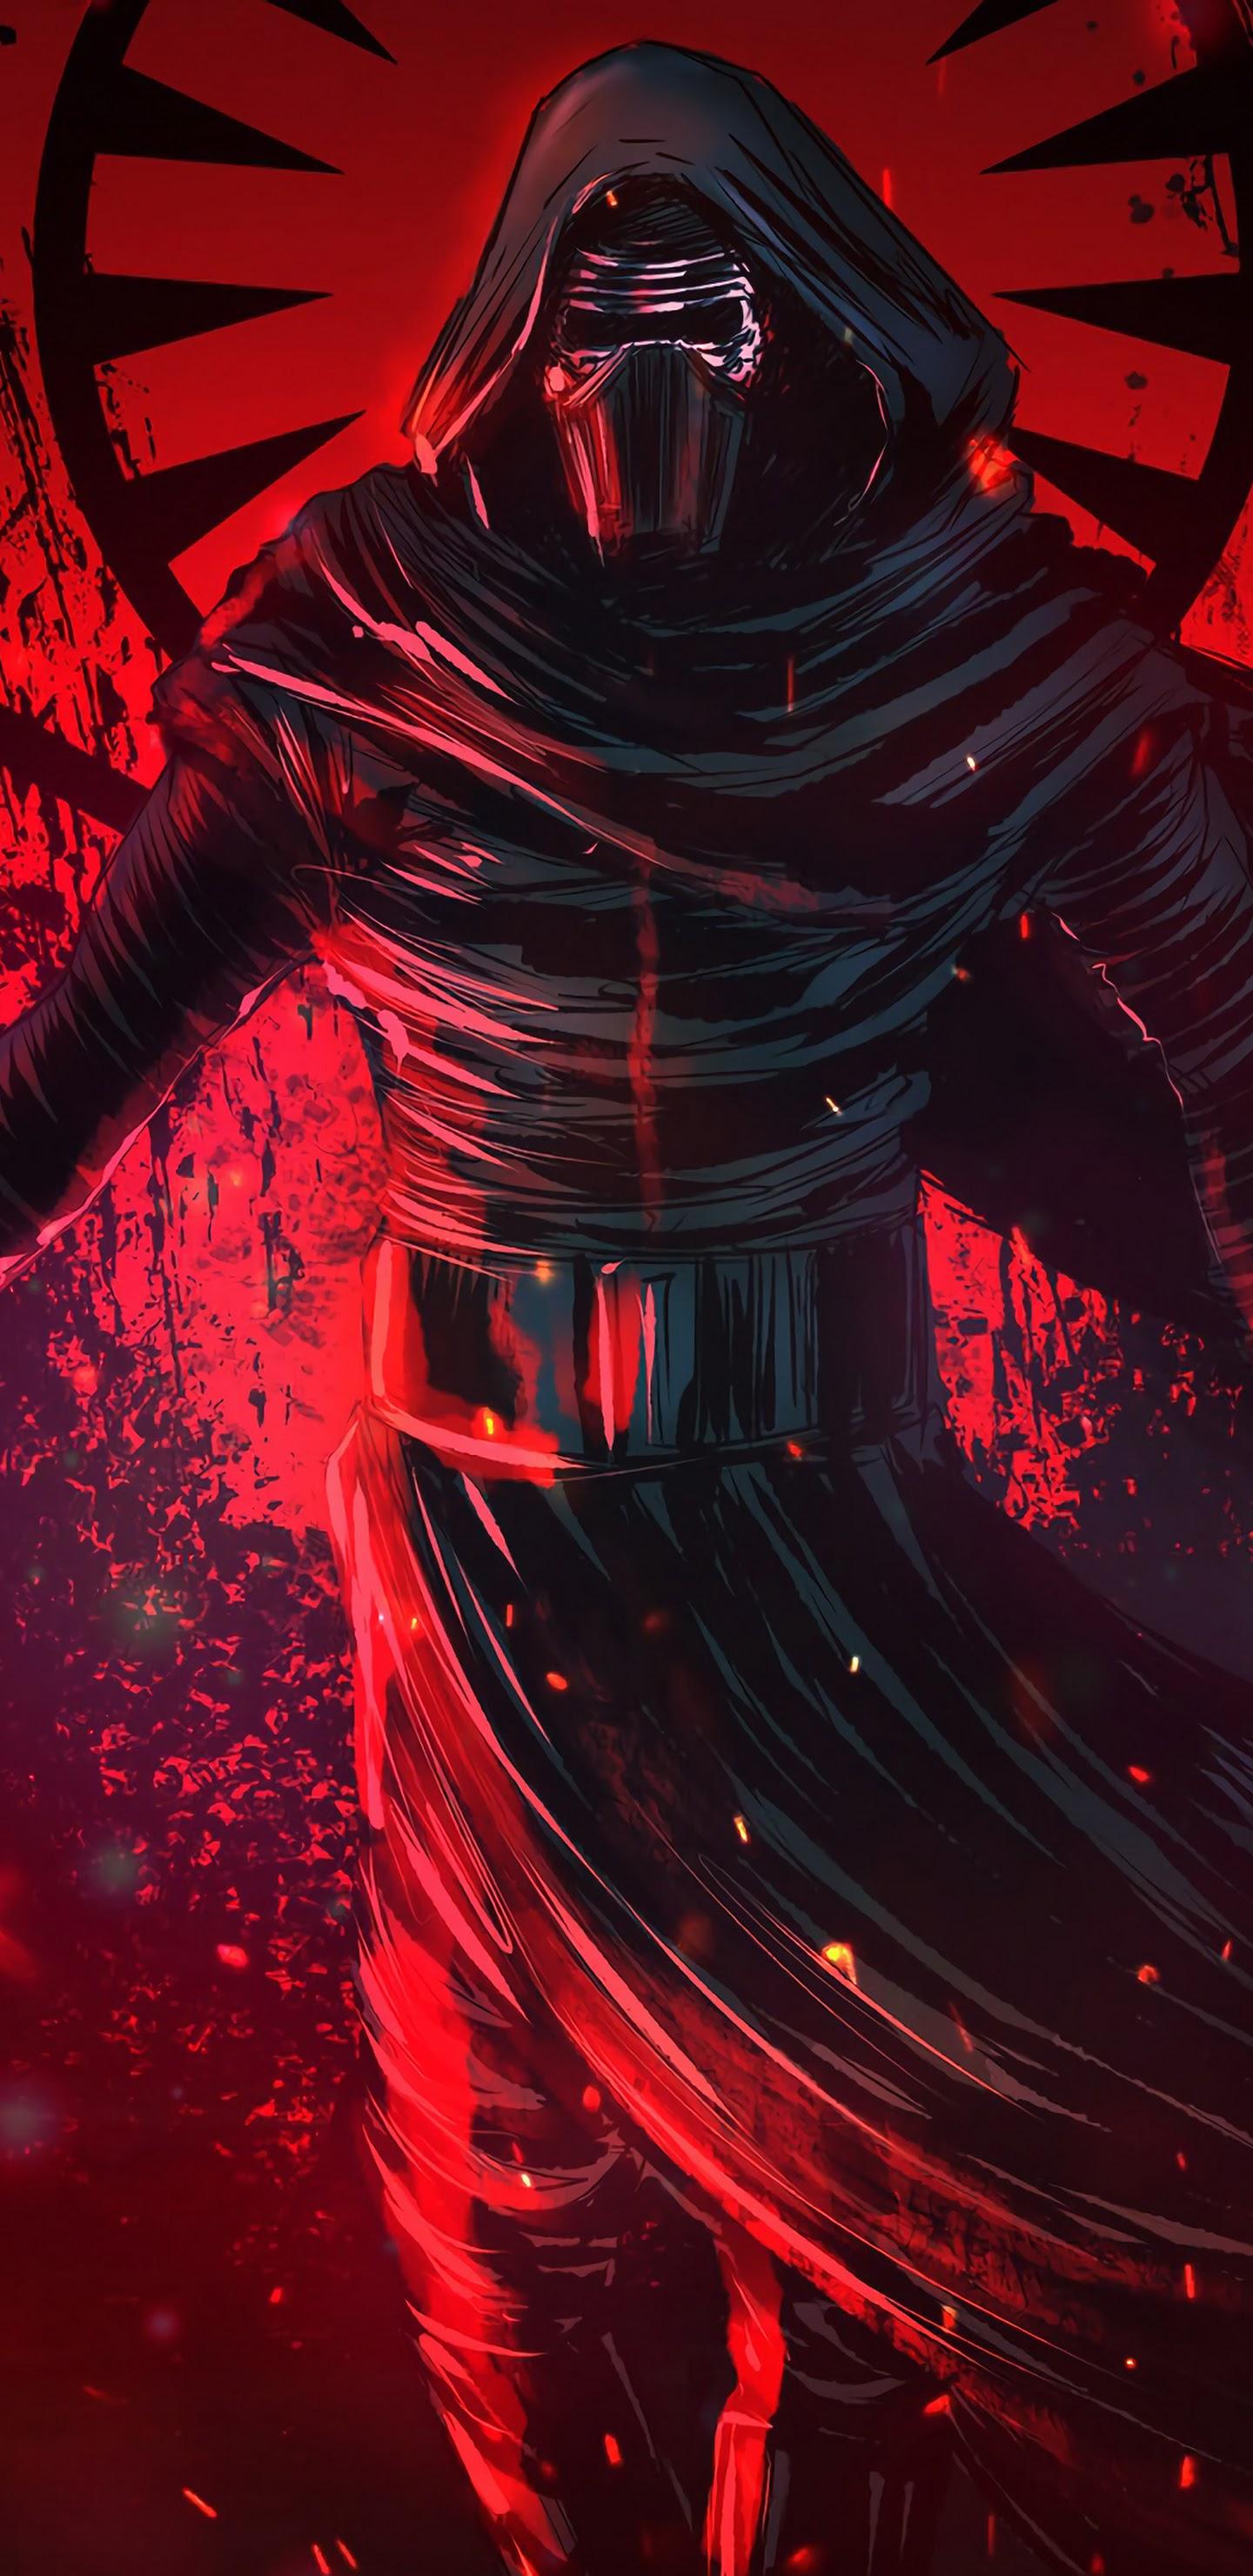 Kylo Ren Lightsaber Star Wars 4k Wallpaper 16